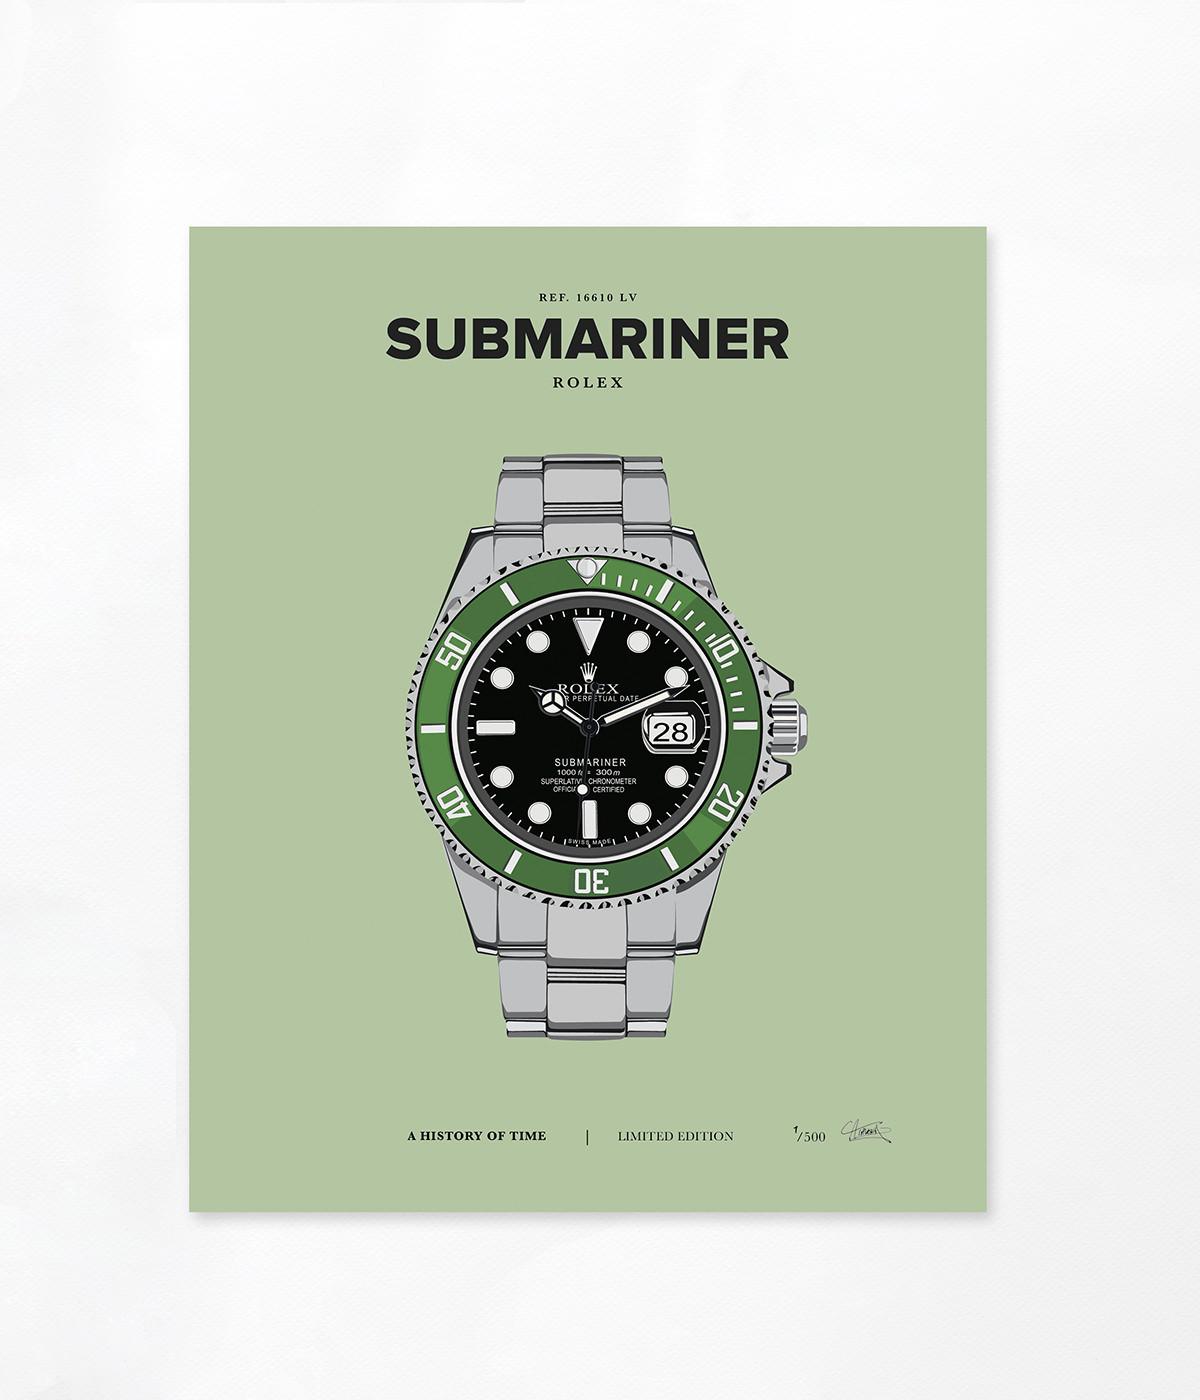 AHOT_P4_Submariner_1_LR